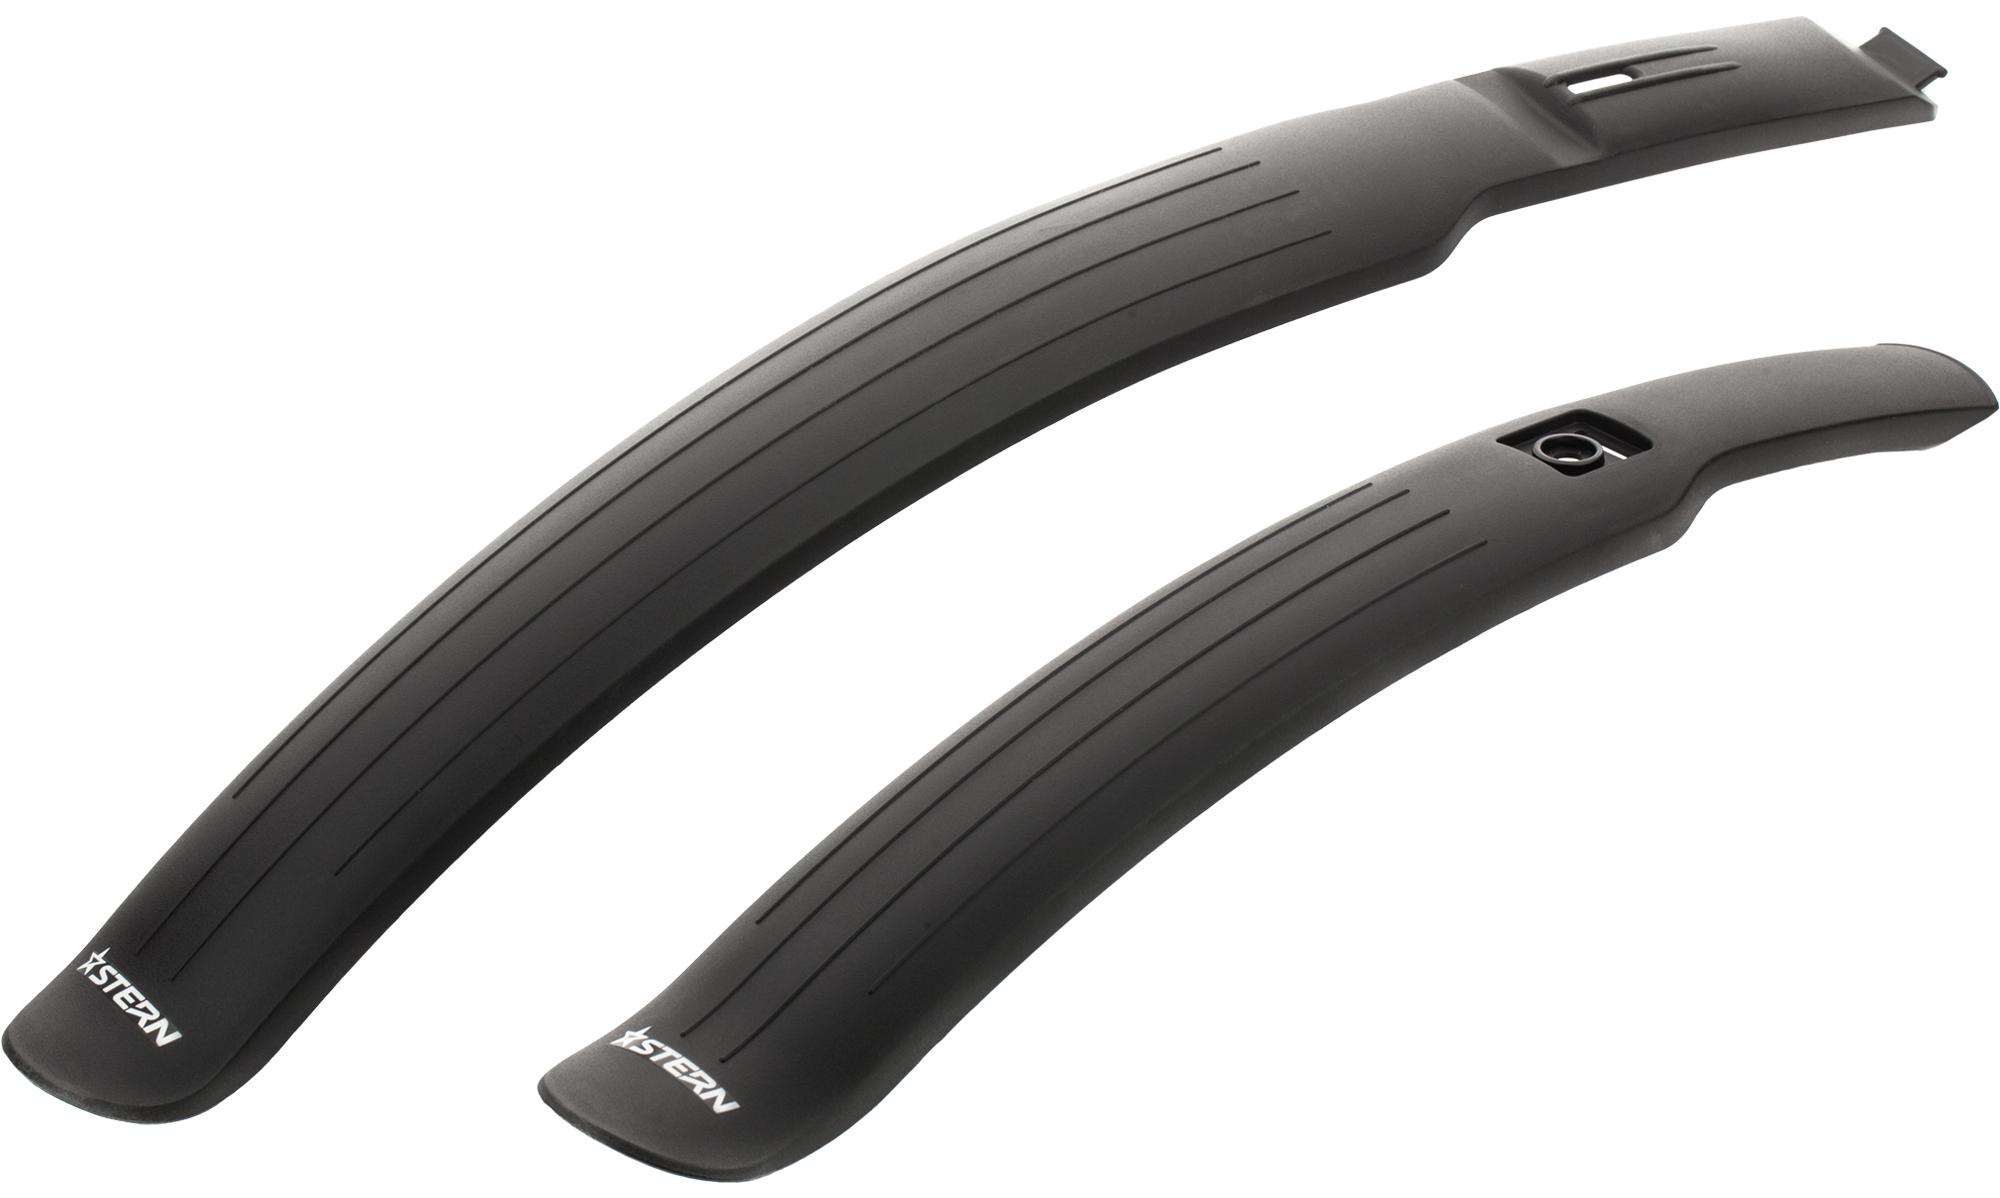 Stern Набор крыльев Stern комплект велосипедных крыльев stg gh 308f r для колес диаметром 18 22 2 шт